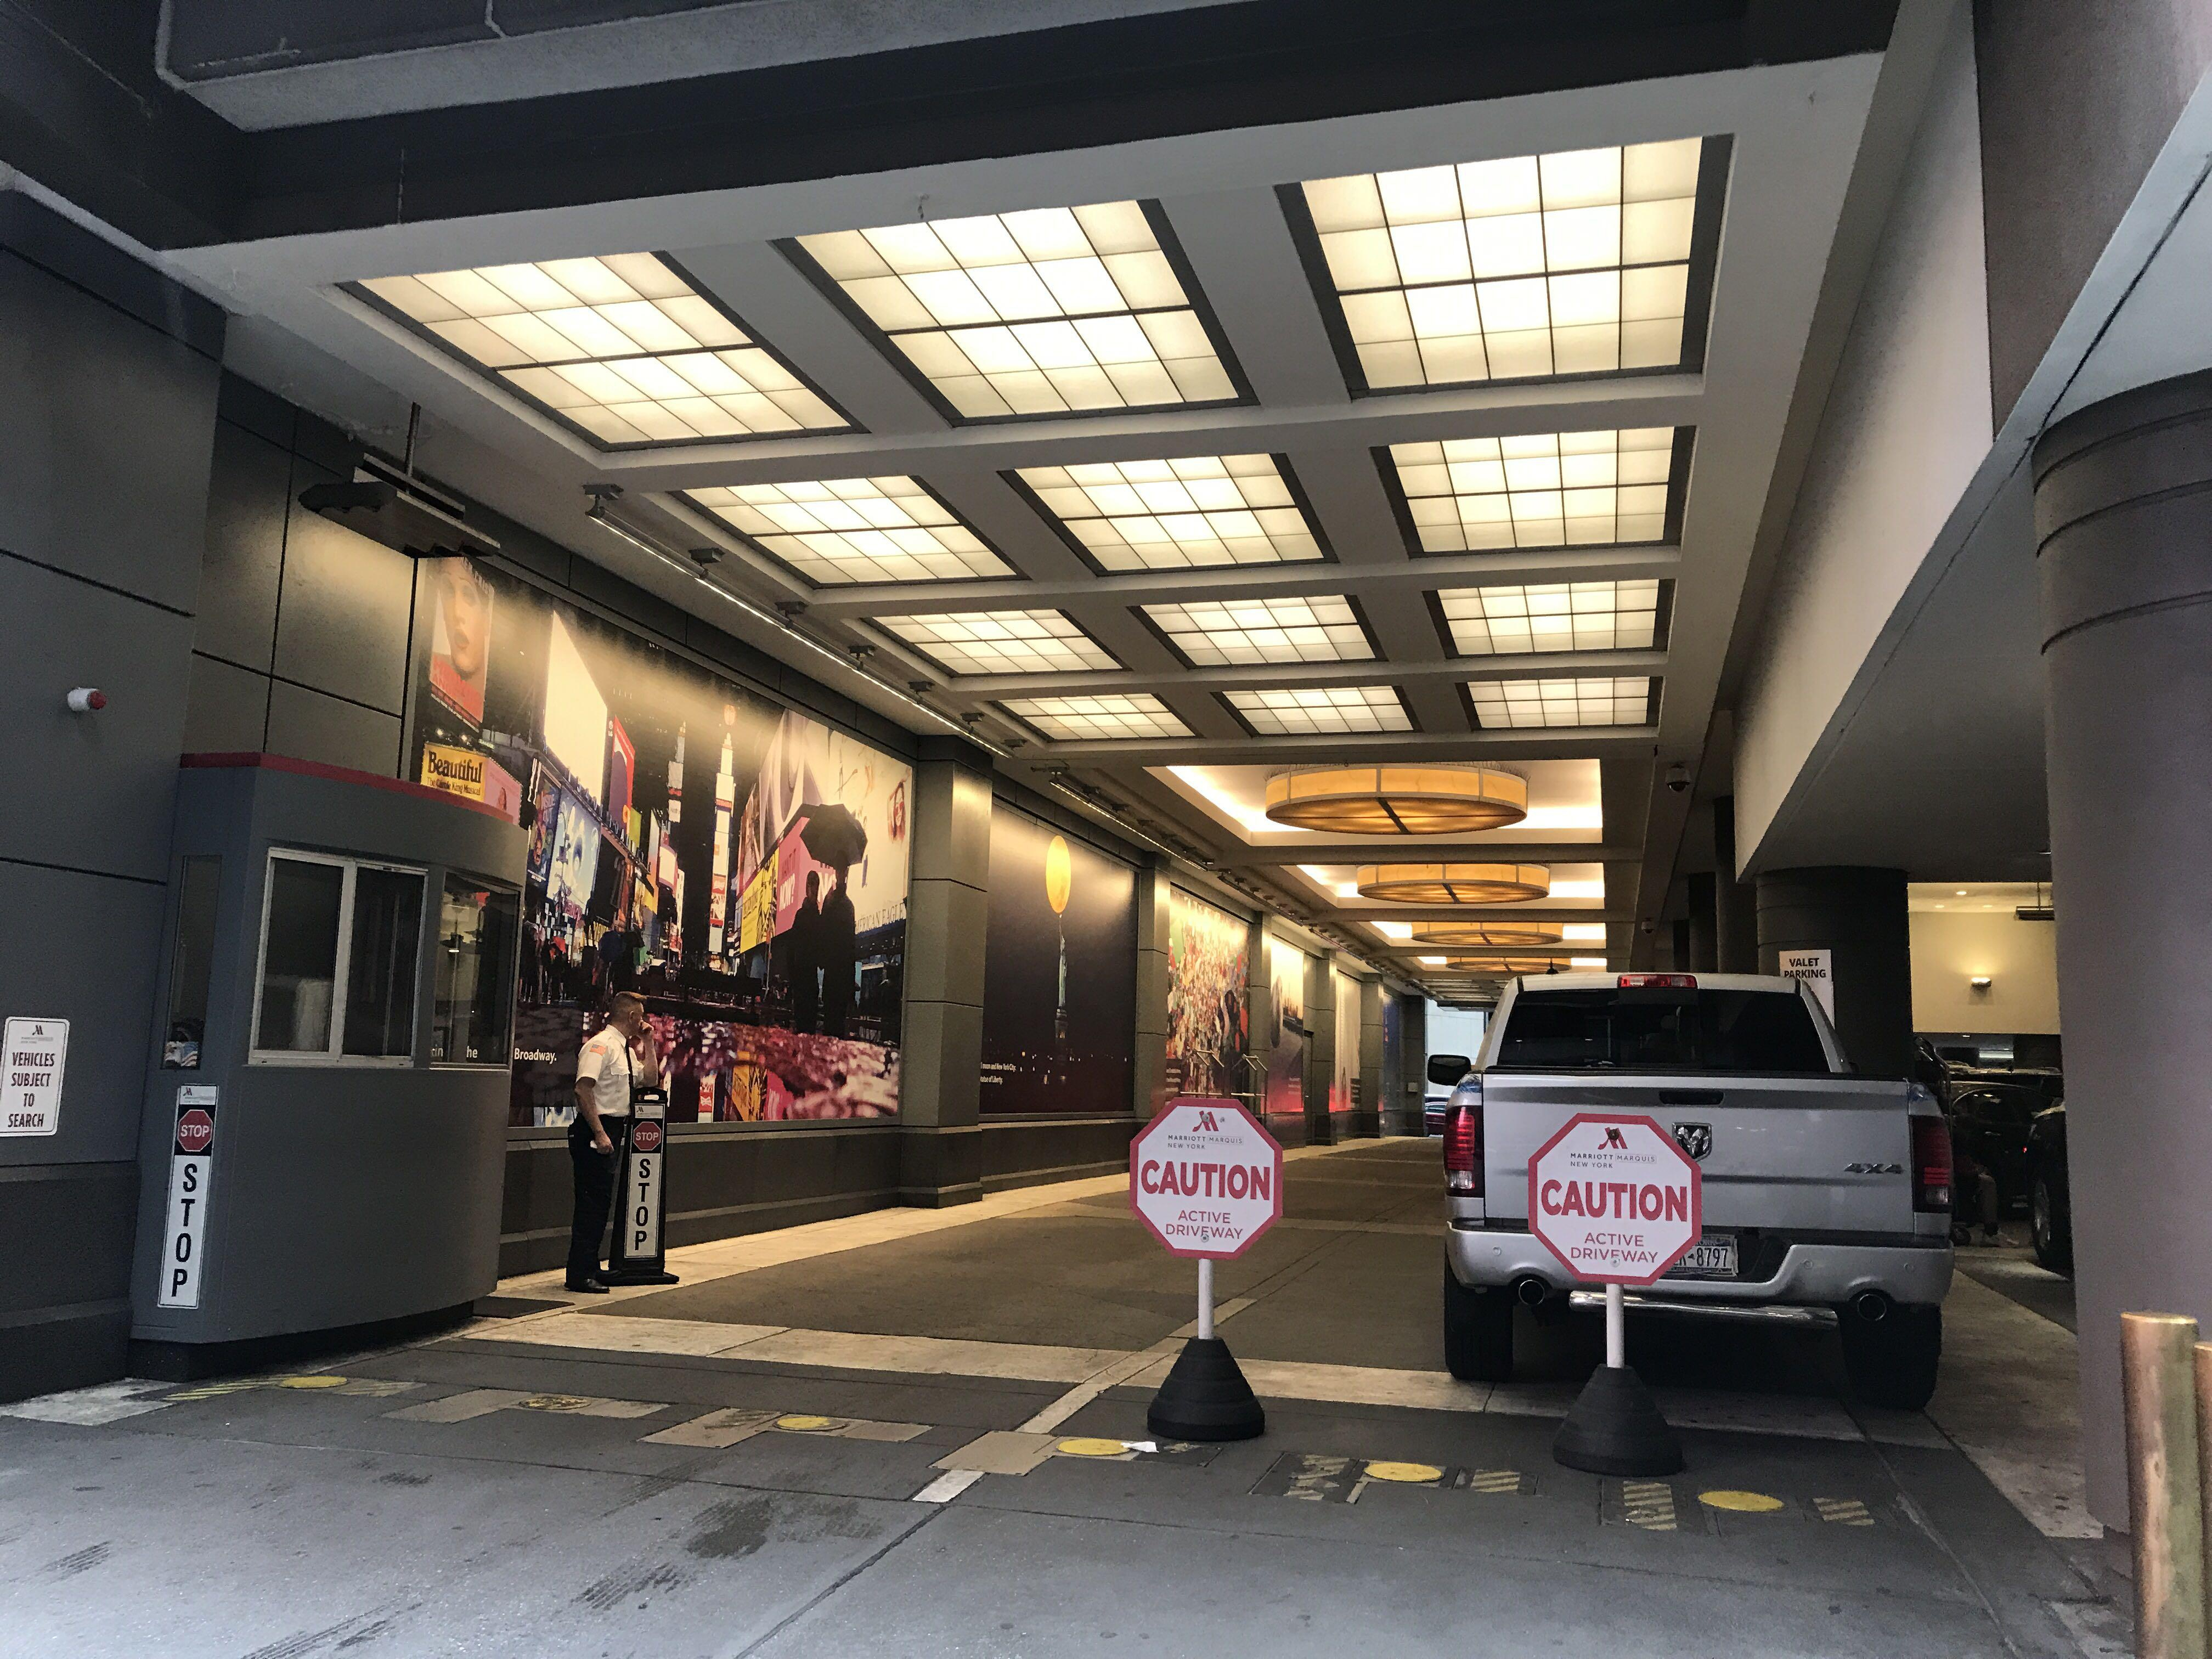 la meilleure attitude b5062 fd4ce New York Marriott Marquis - Parking in New York | ParkMe